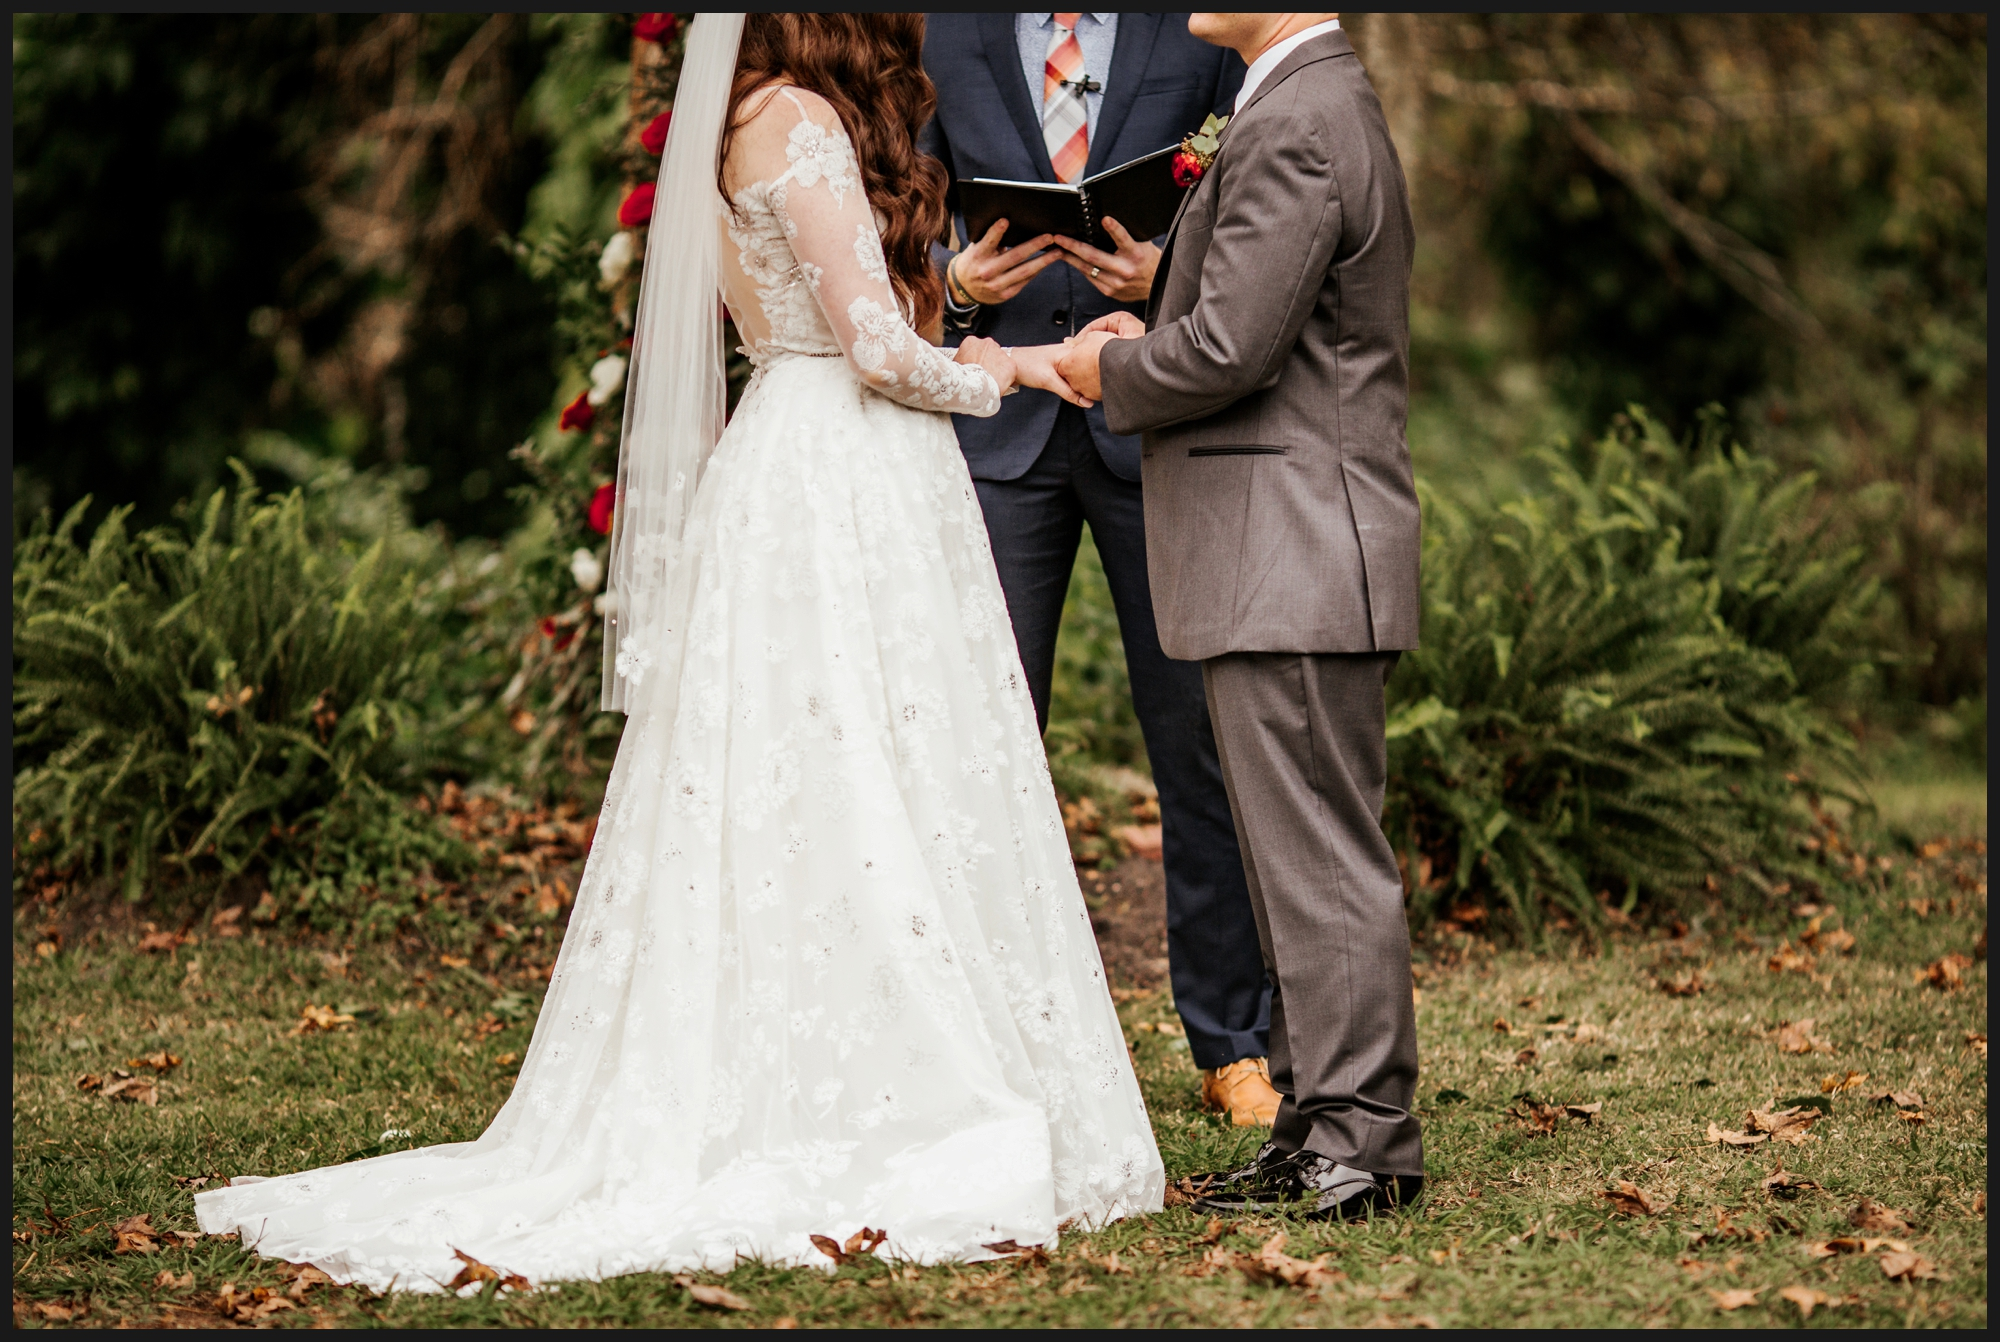 Orlando-Wedding-Photographer-destination-wedding-photographer-florida-wedding-photographer-hawaii-wedding-photographer_0525.jpg